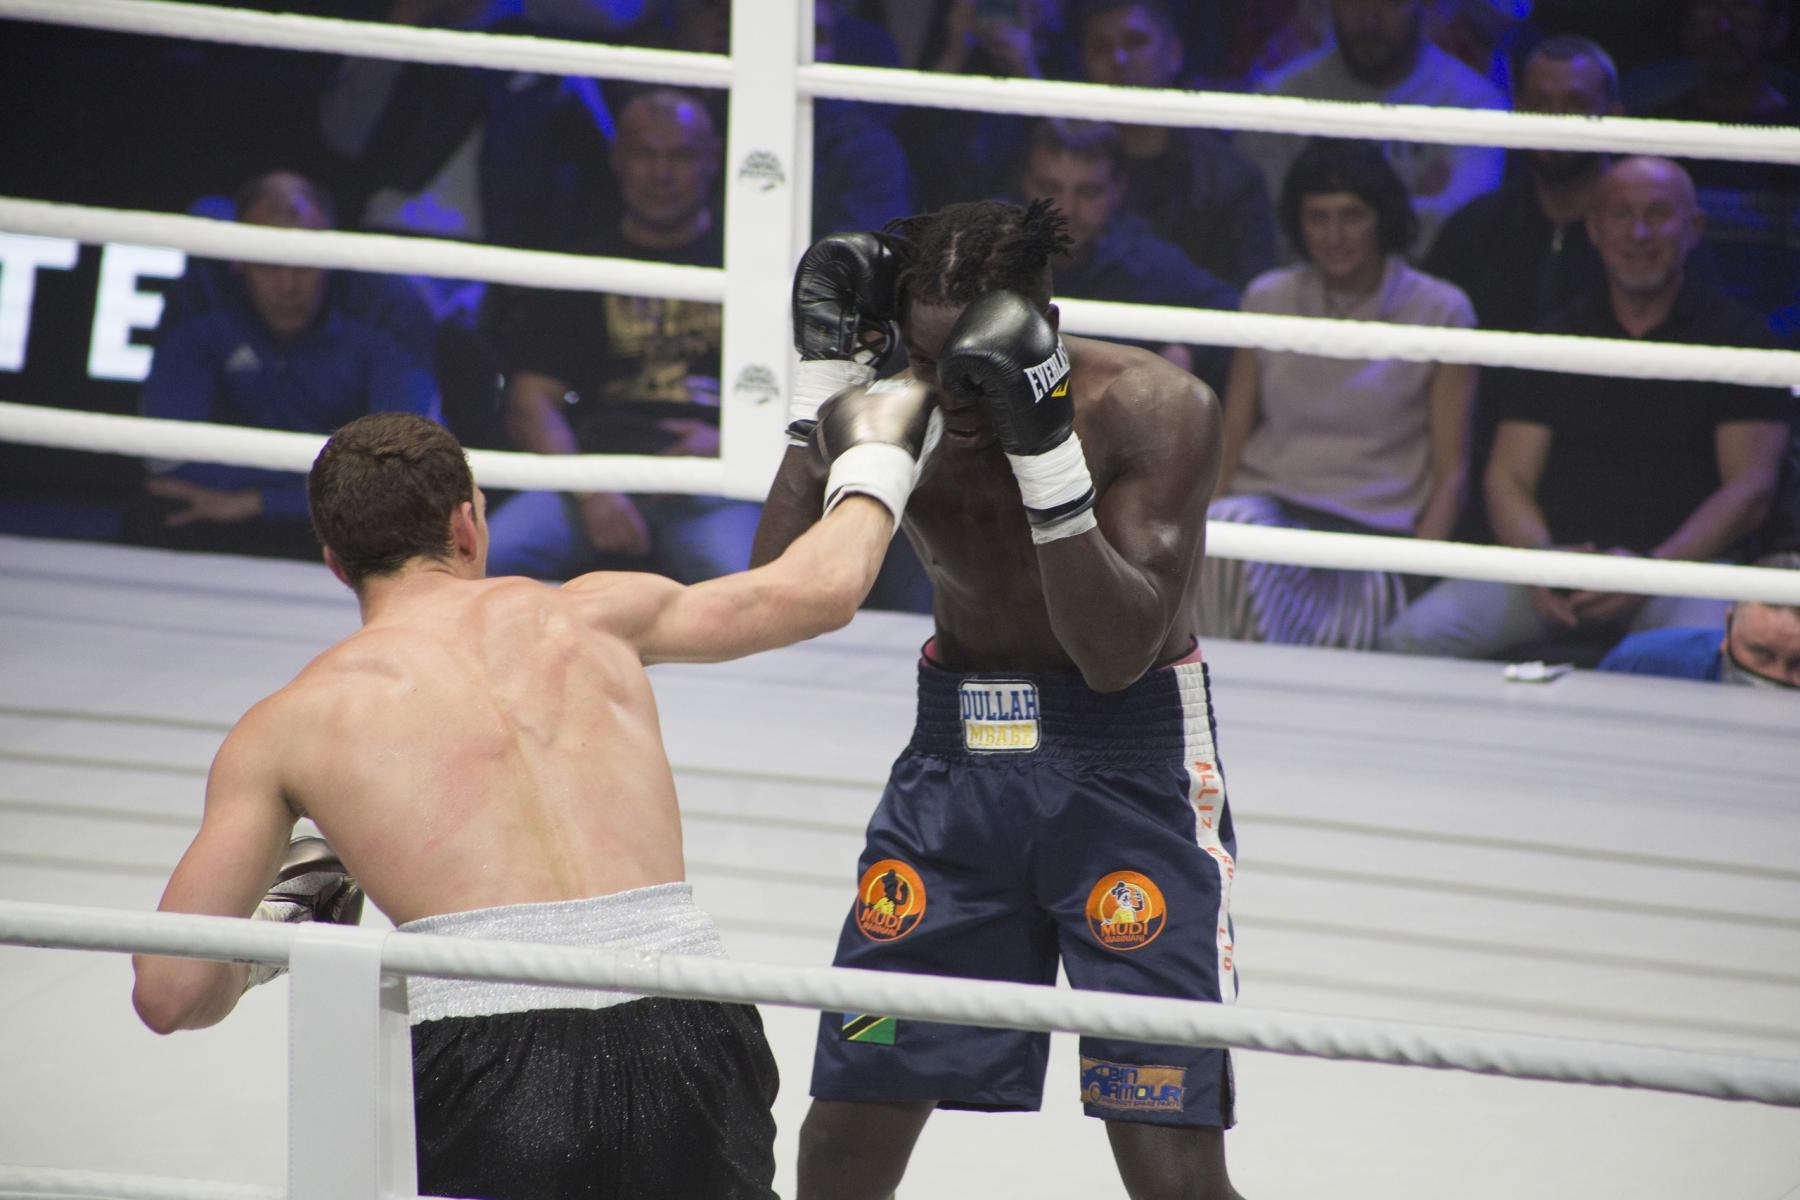 фото Боксёр из Новосибирска Павел Силягин стал азиатско-тихоокеанским чемпионом WBO 5